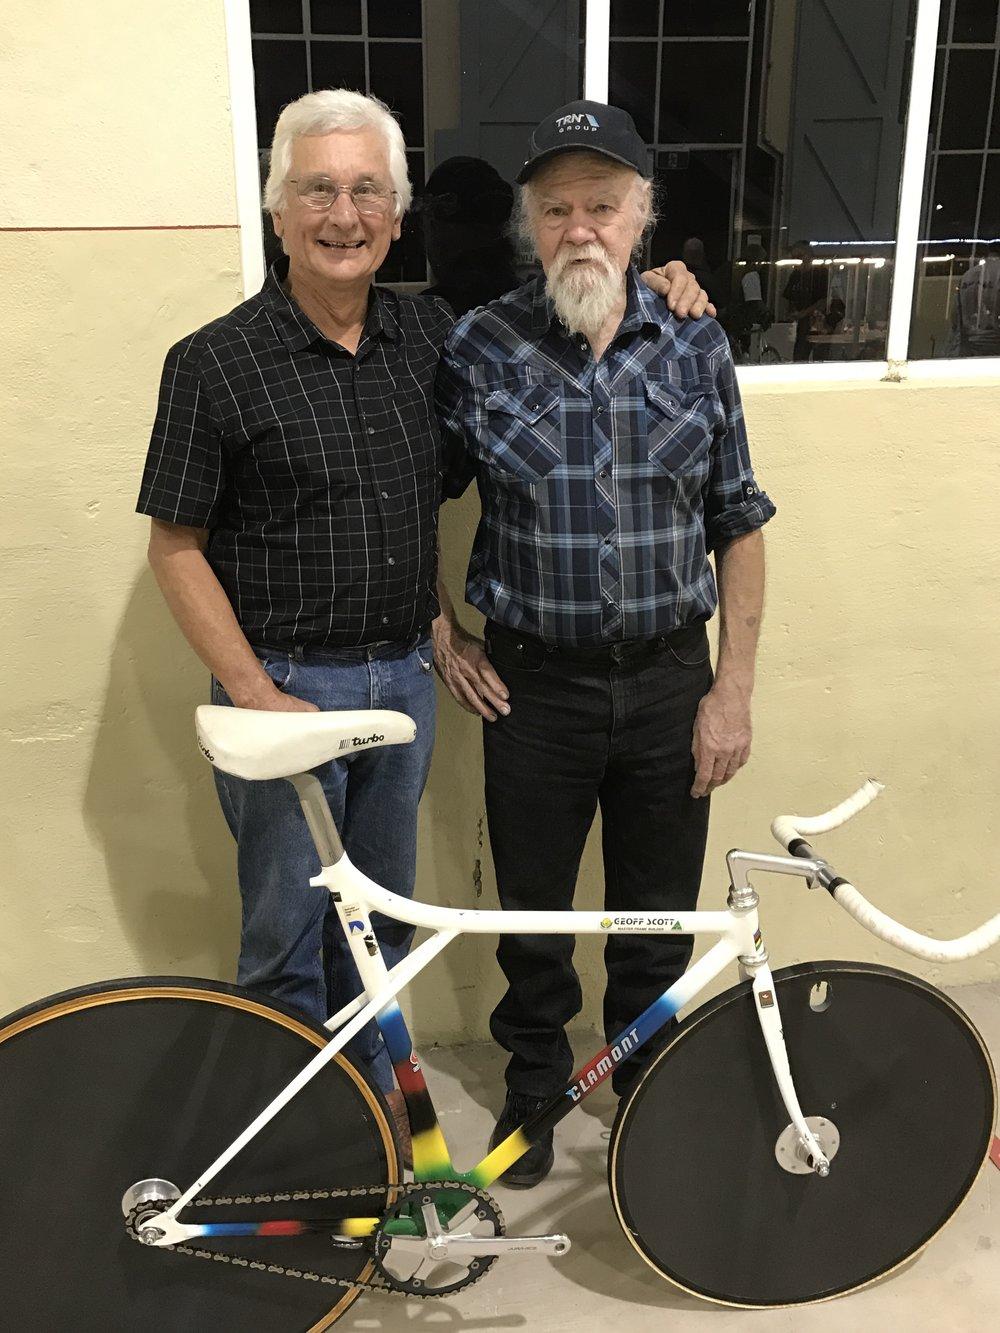 John Crouchley (BiciSport) with Geoff Scott & the Martin Vinnicombe Championship winning track bike. John Crouchley was the coach of Martin Vinnicombe .